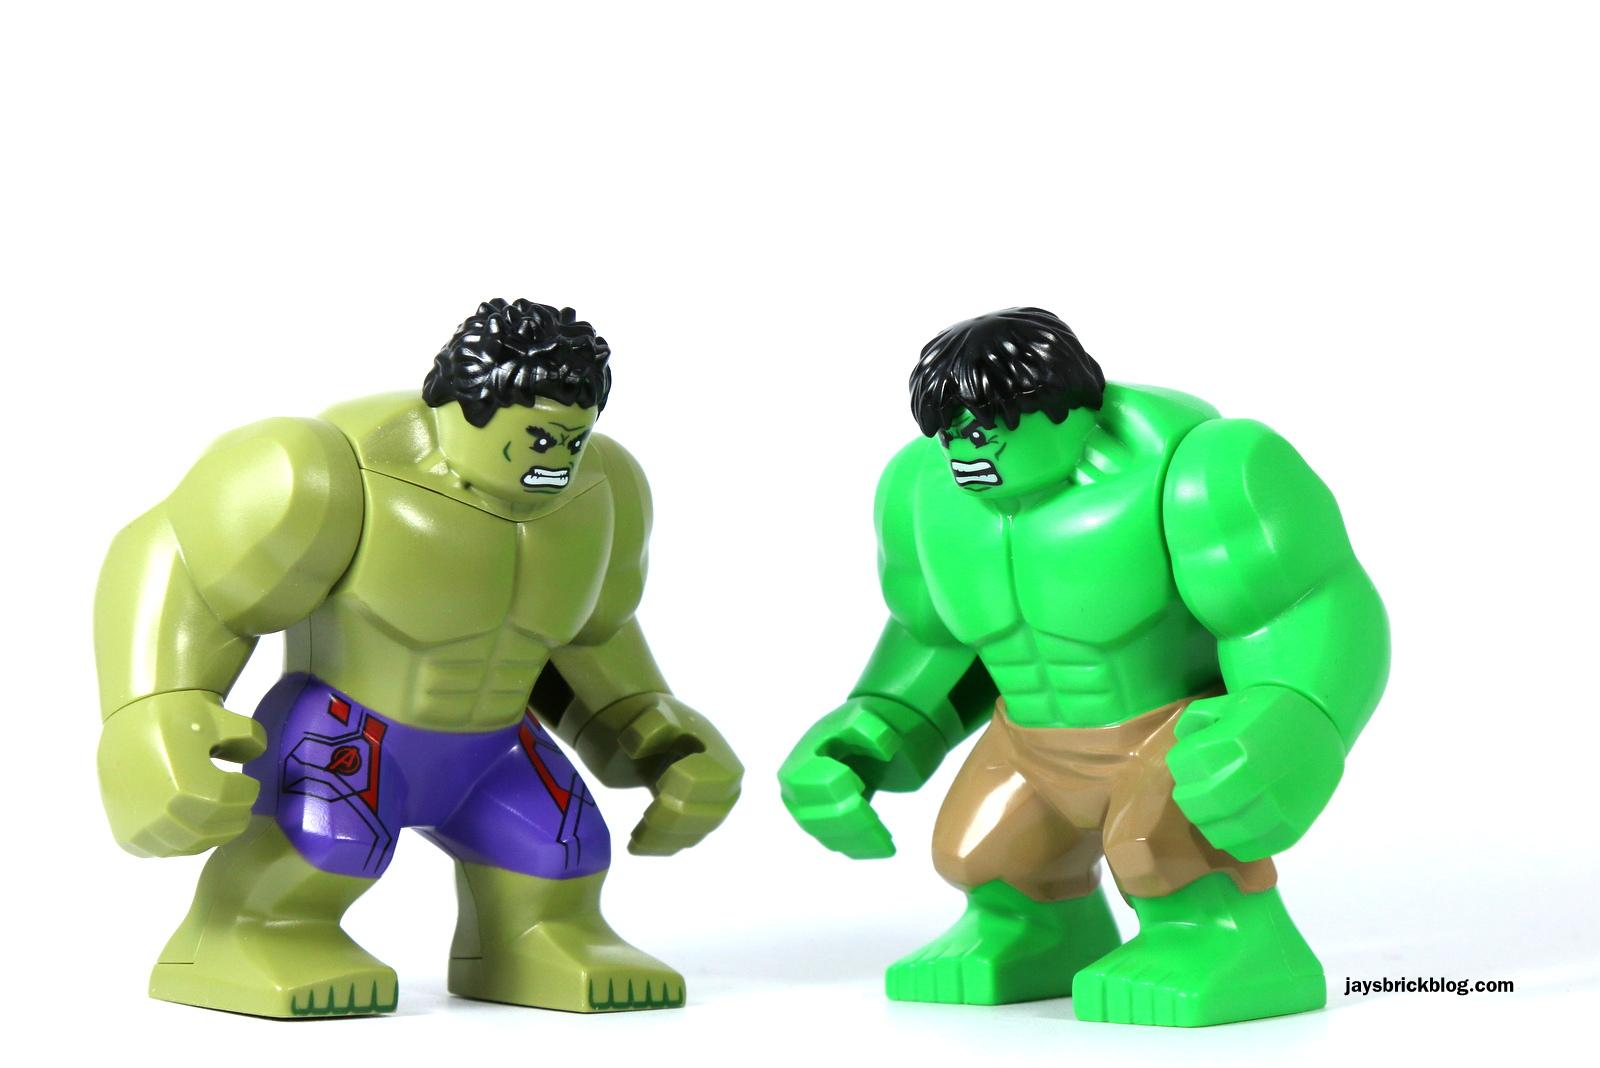 Hilarious LEGO Hulk Buster Brickfilm | Groove Bricks